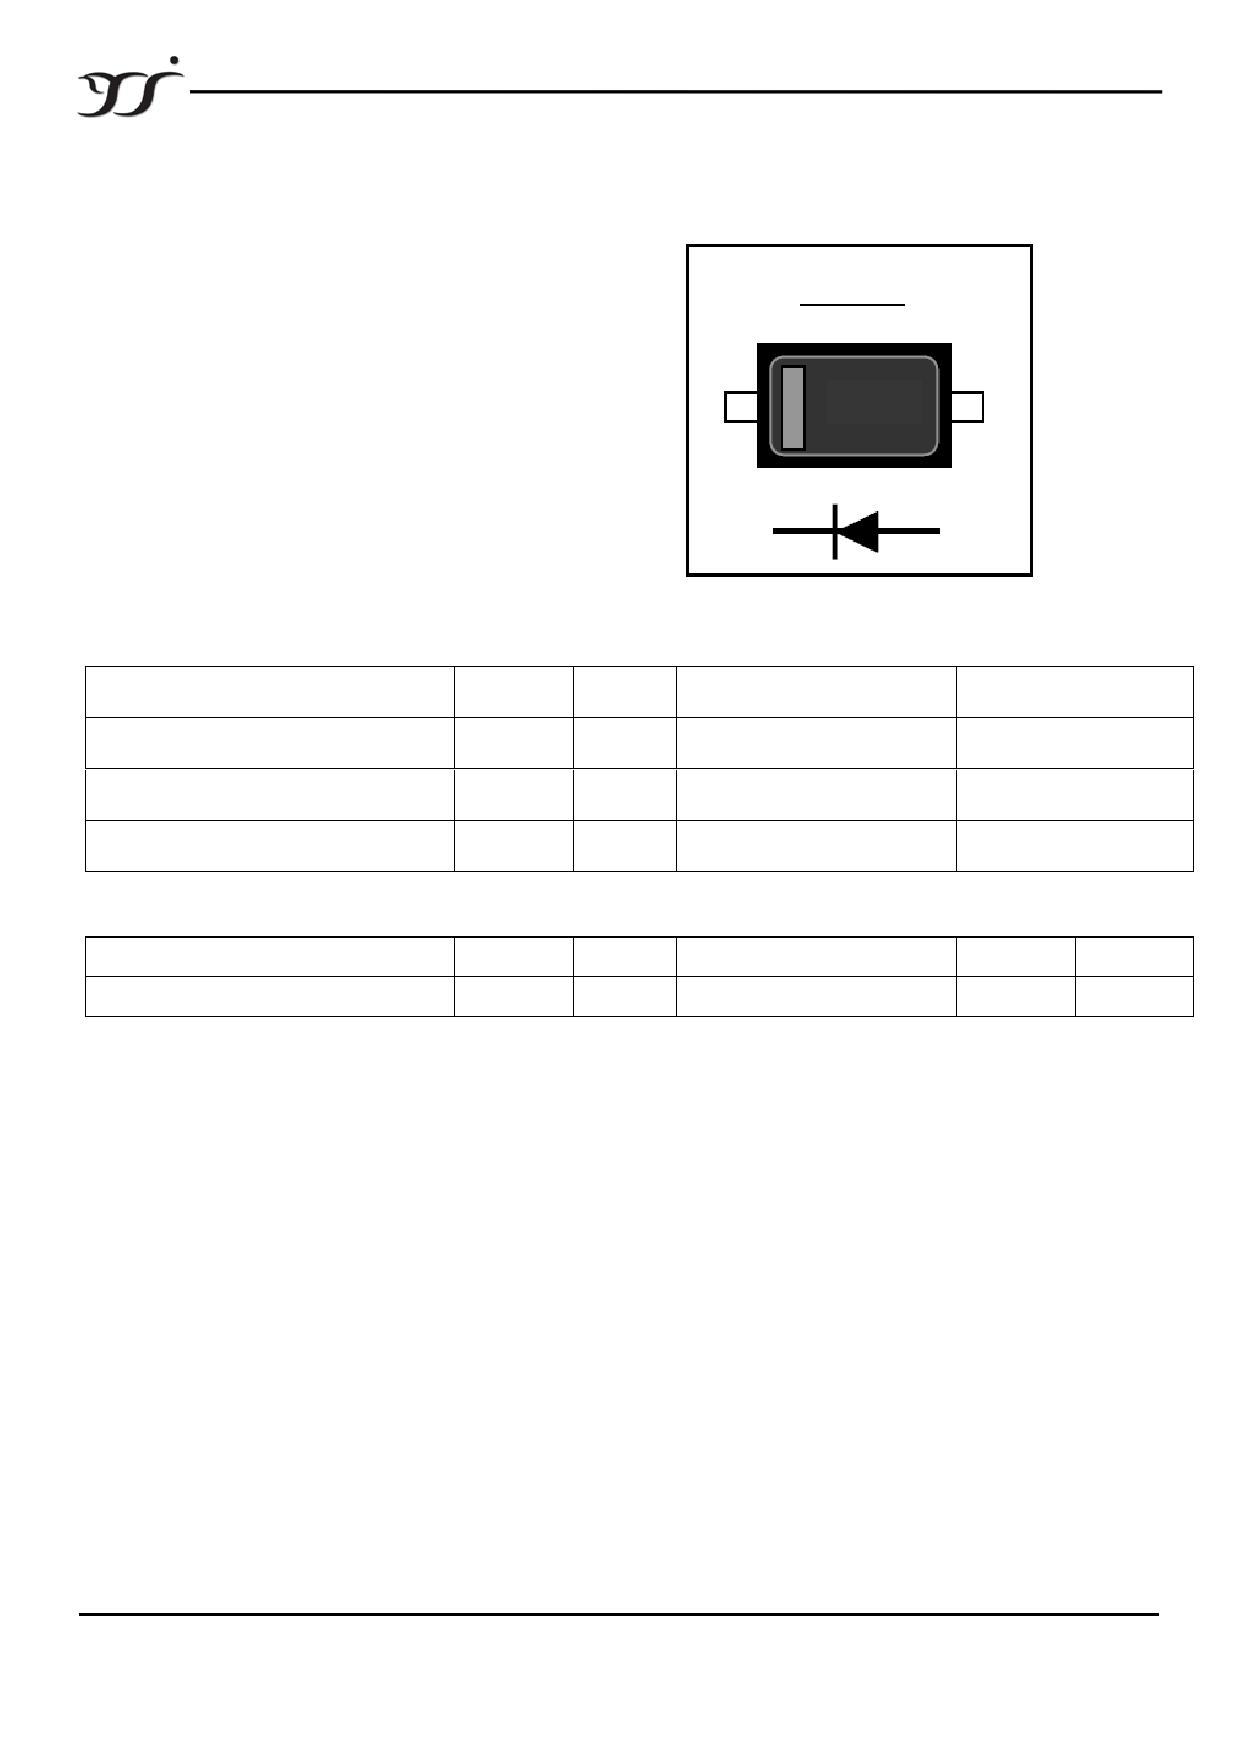 MMSZ5245B Datasheet